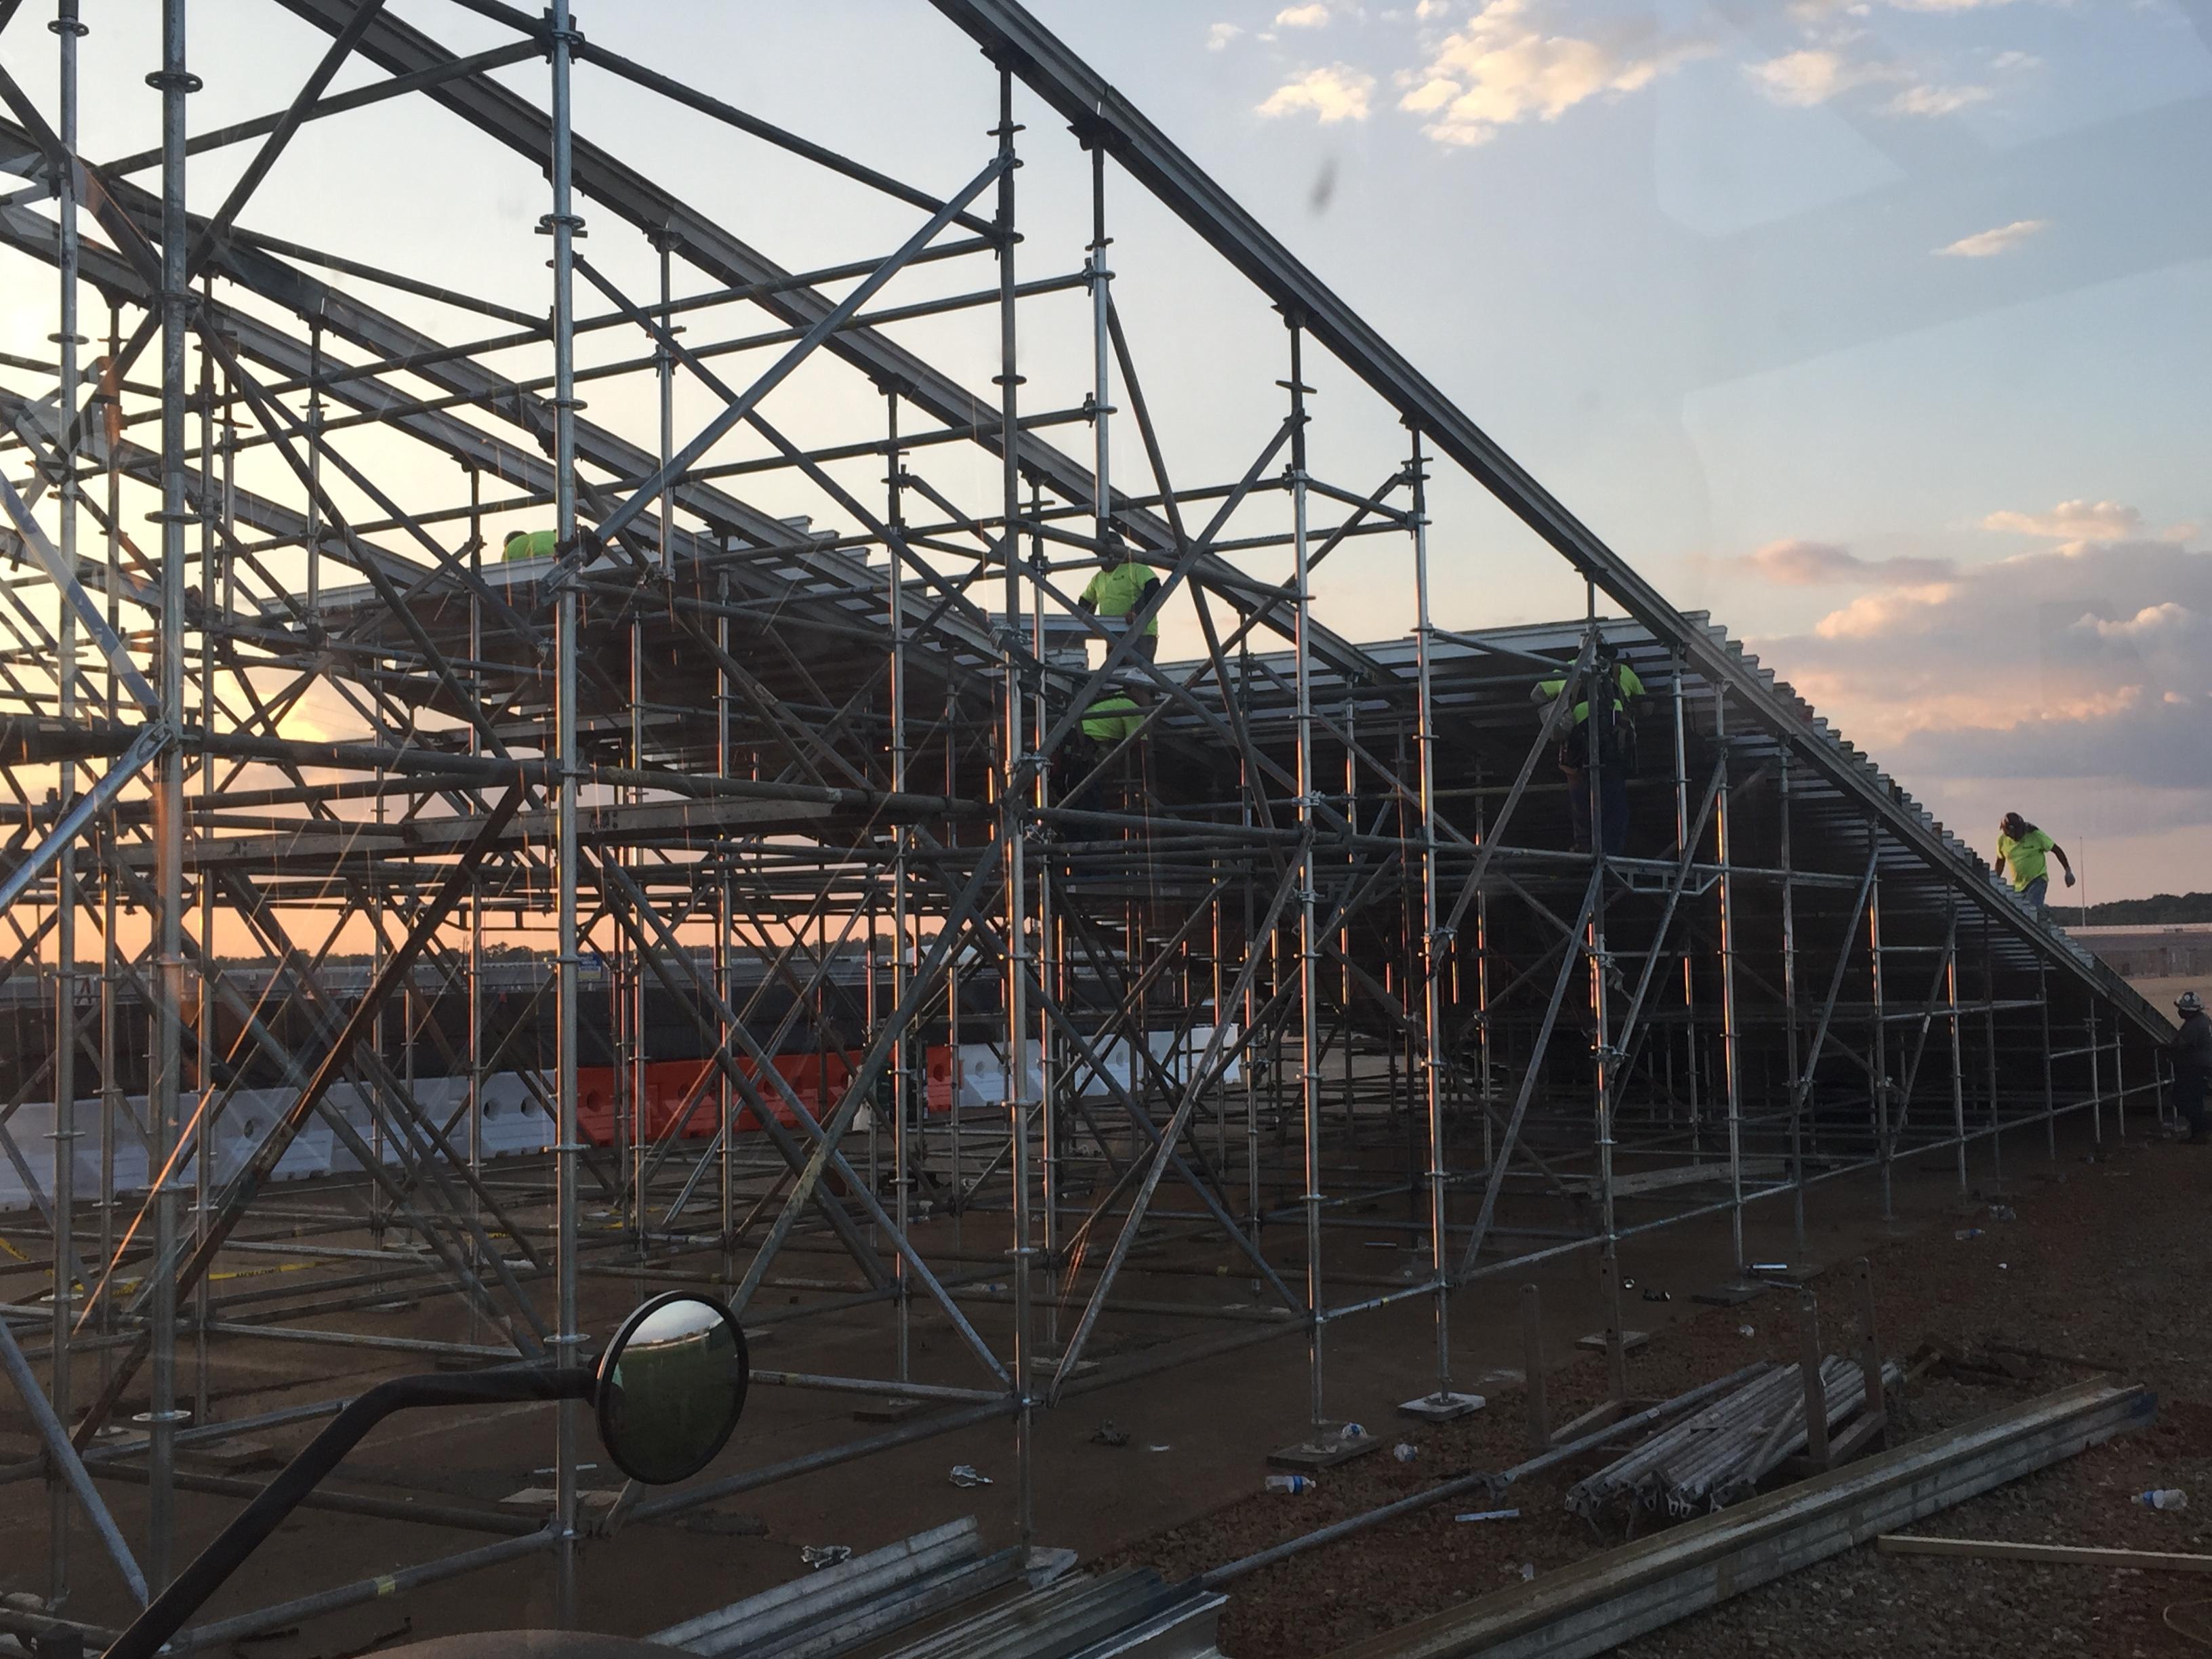 Talledega Superspeedway scaffold motorcycle ramp 4